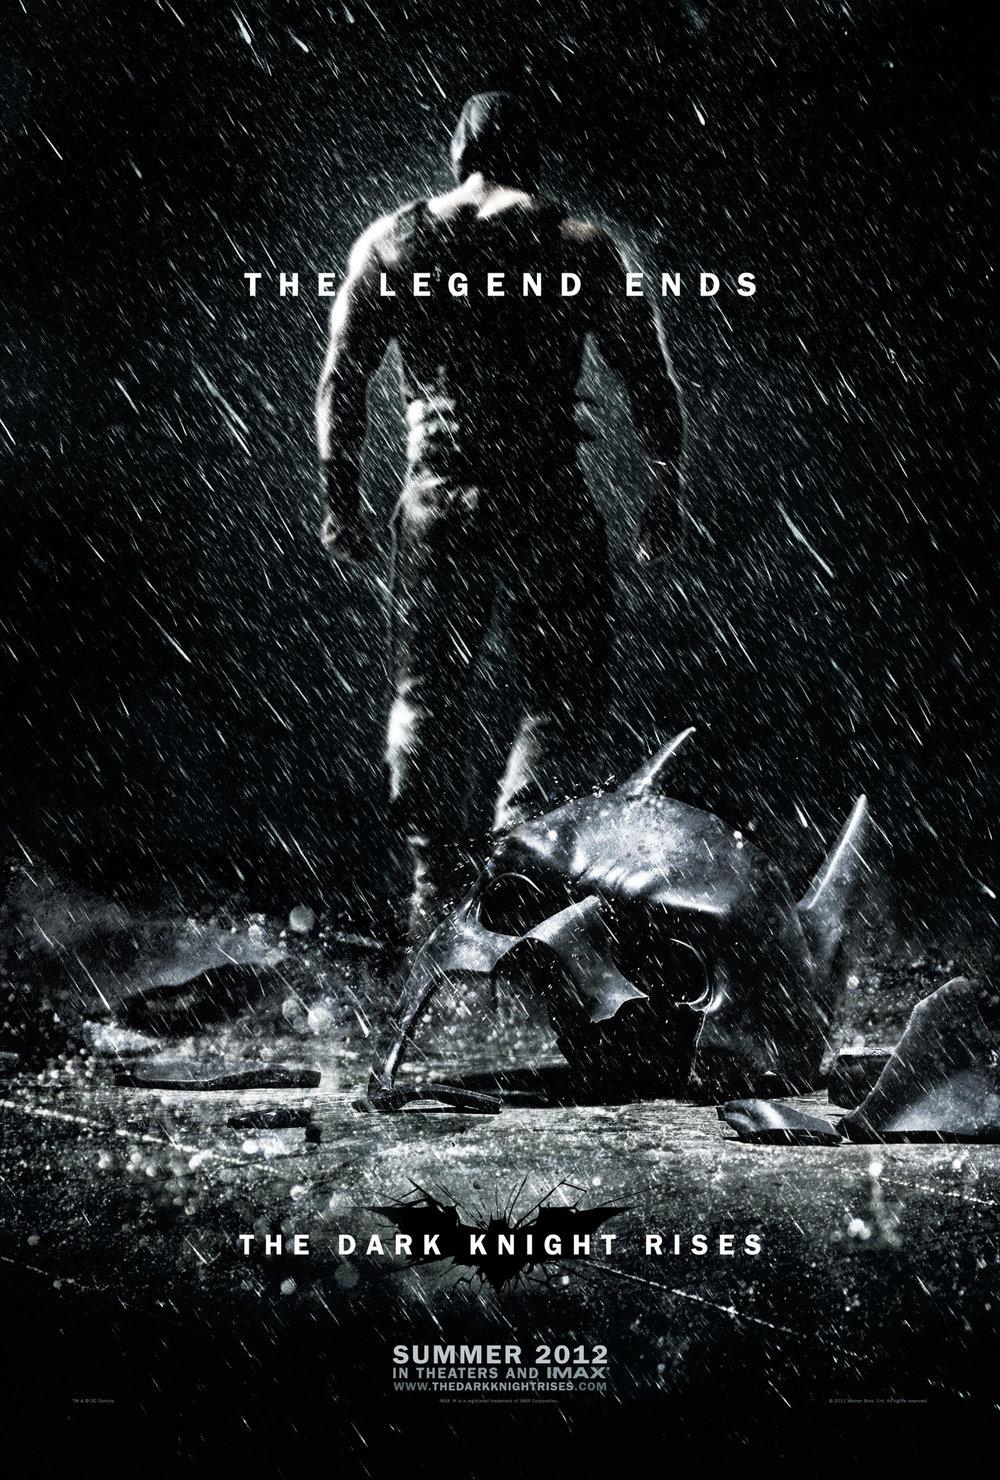 TheDarkKnightRises_Poster.jpg